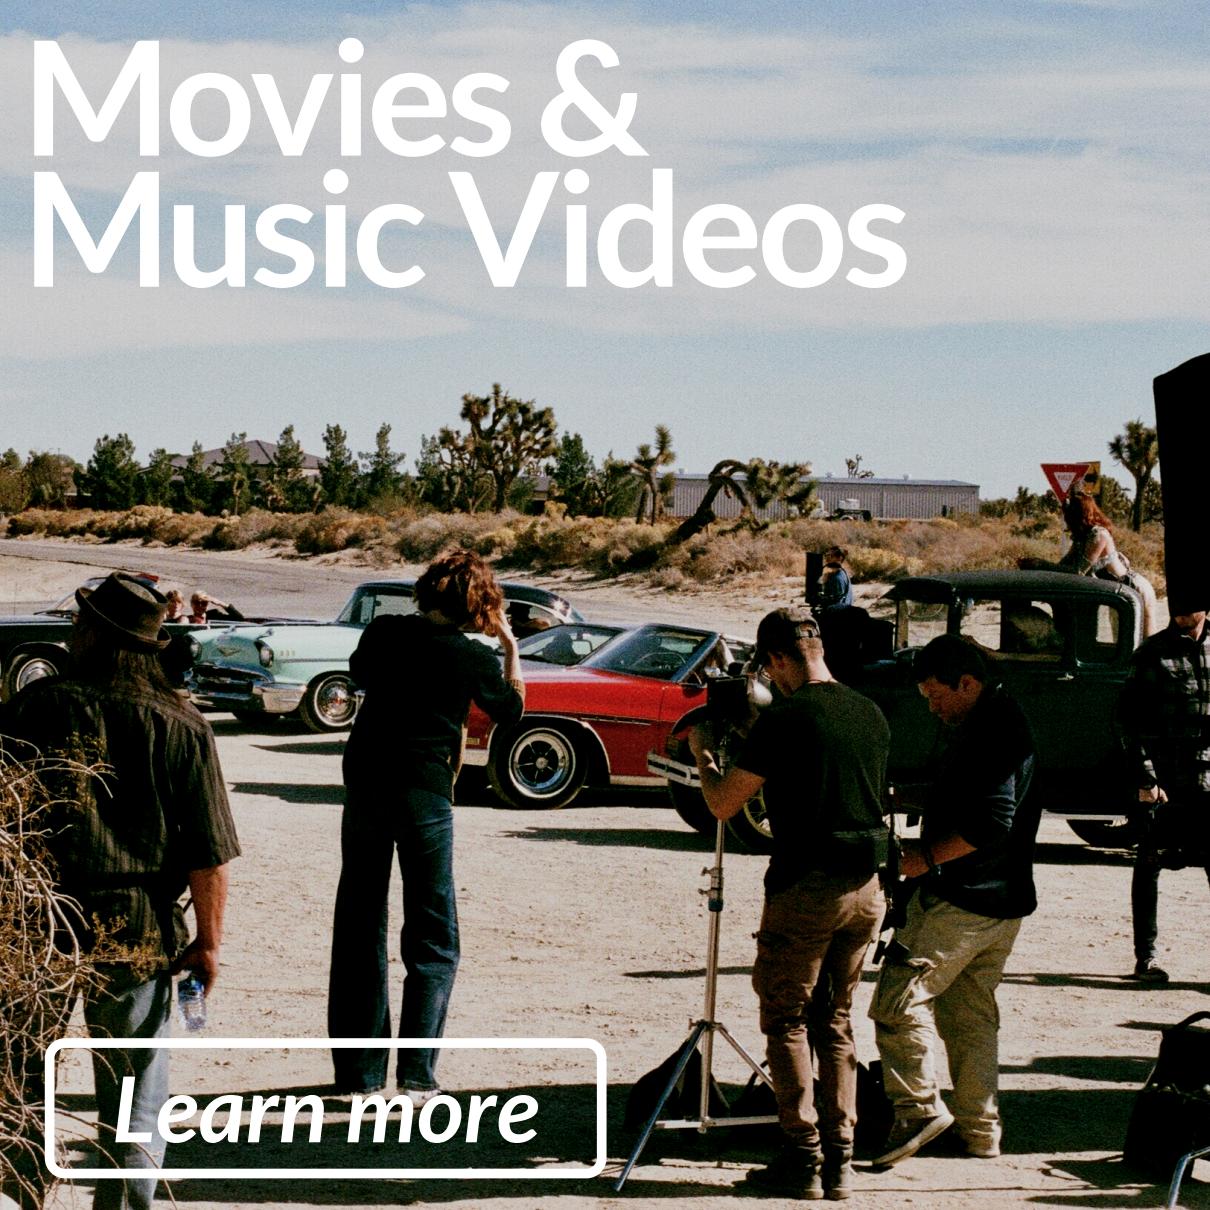 Movies & Music Videos